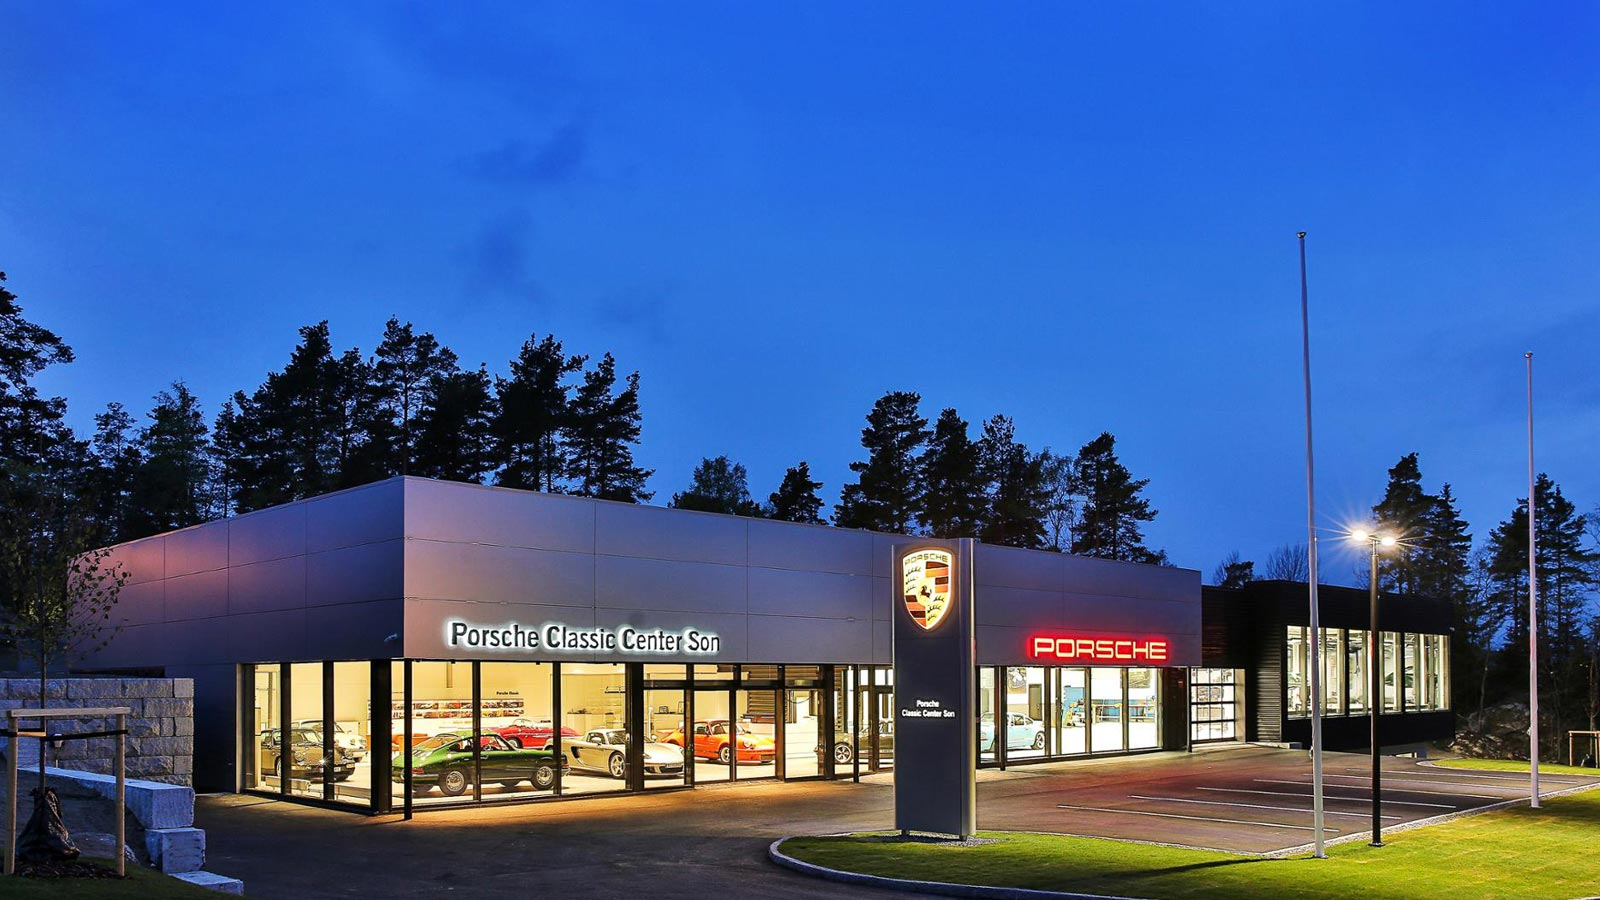 Porsche - Порше Классик Центр Сон